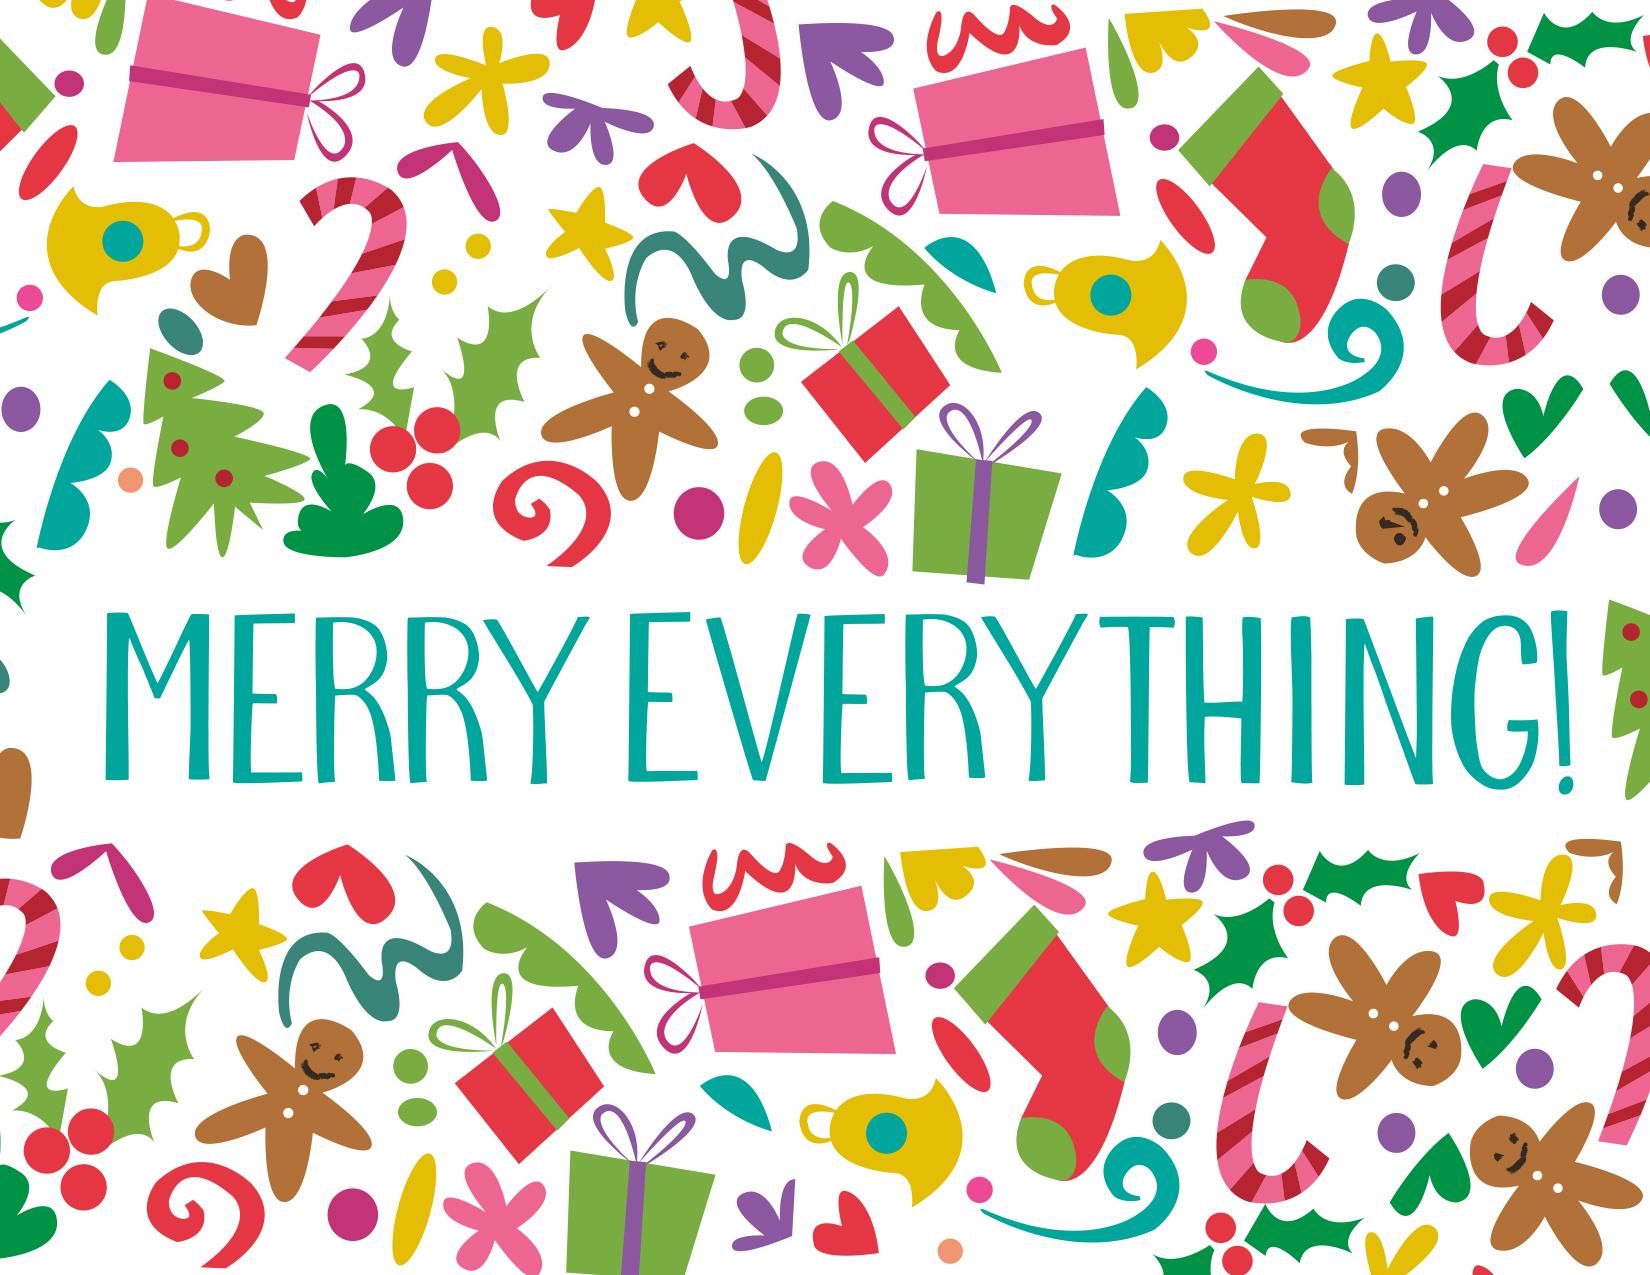 Merry Everythning.jpg